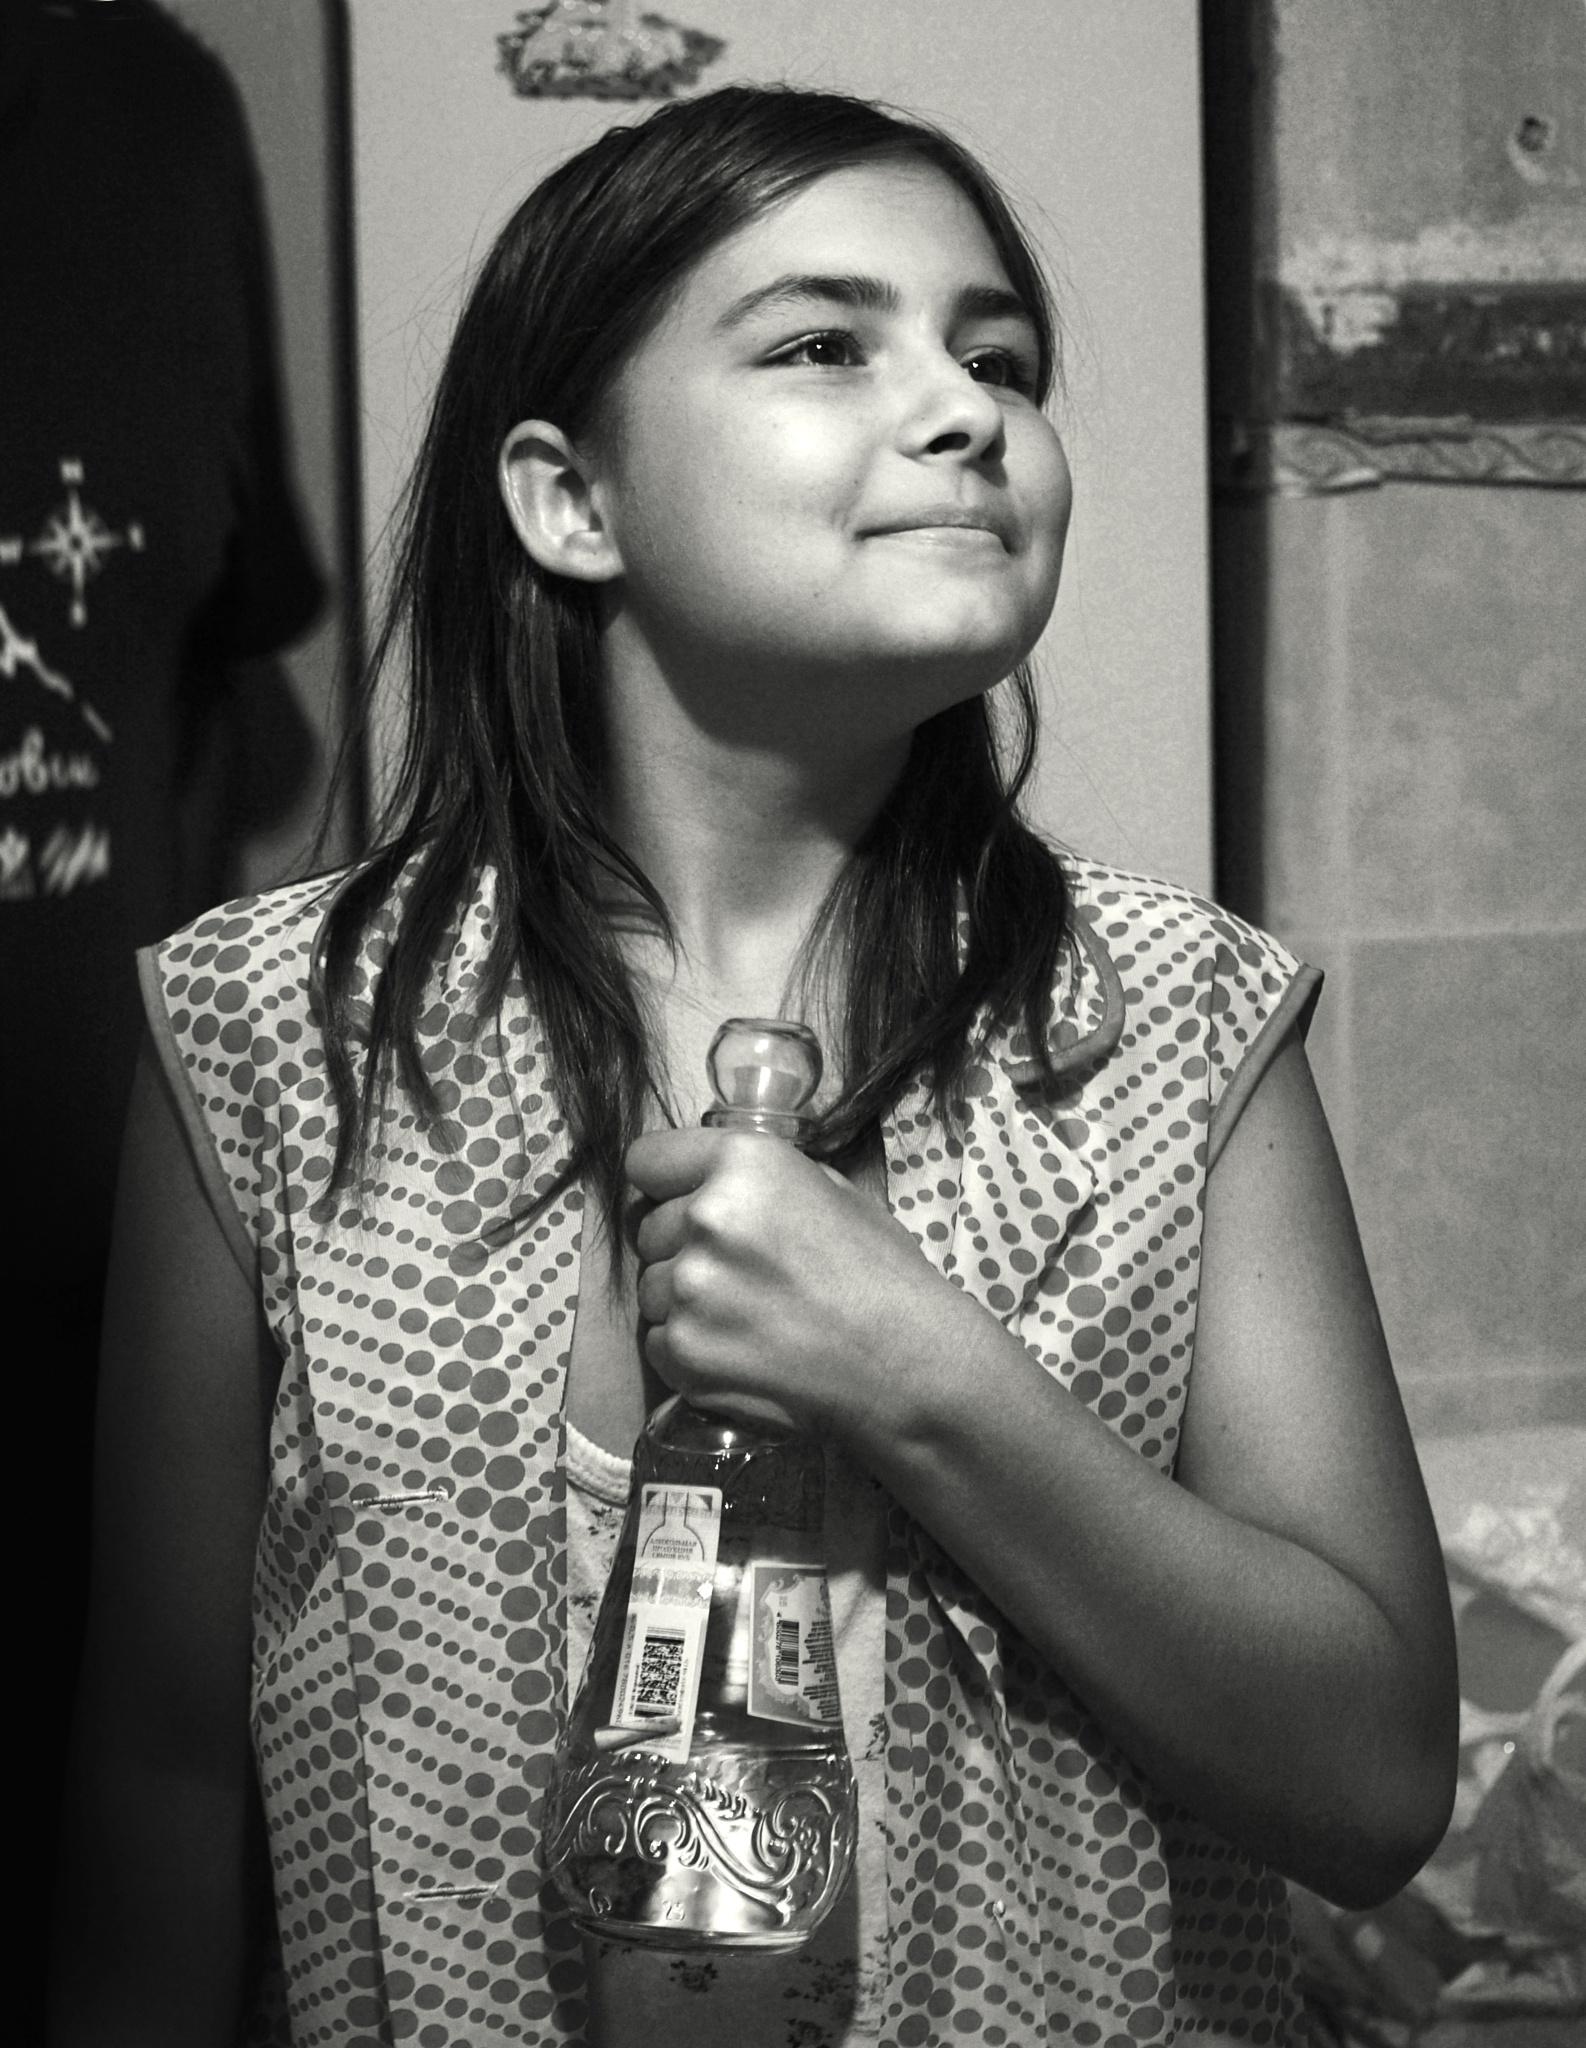 Julia and a bottle of vodka by Сергей Юрьев